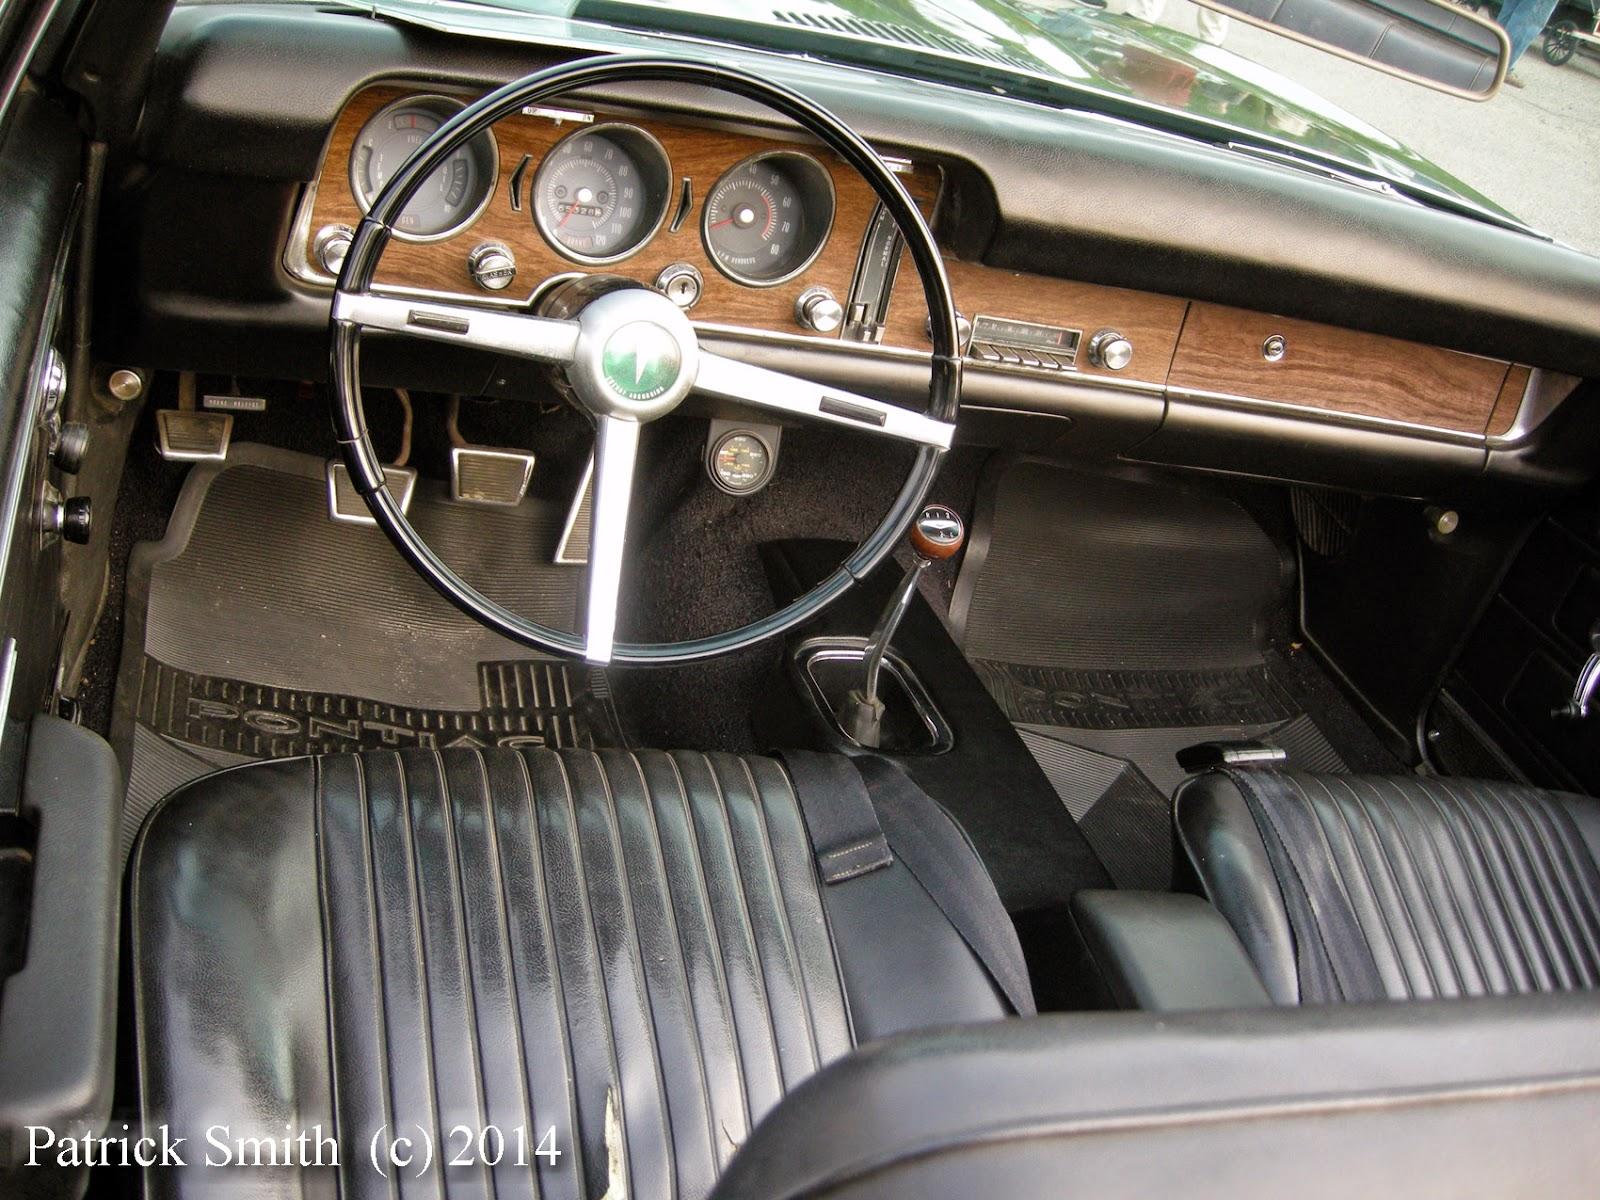 1965 pontiac gto rally gauge wiring diagram explained wiring diagrams rh sbsun co 67 firebird wiring [ 1600 x 1200 Pixel ]